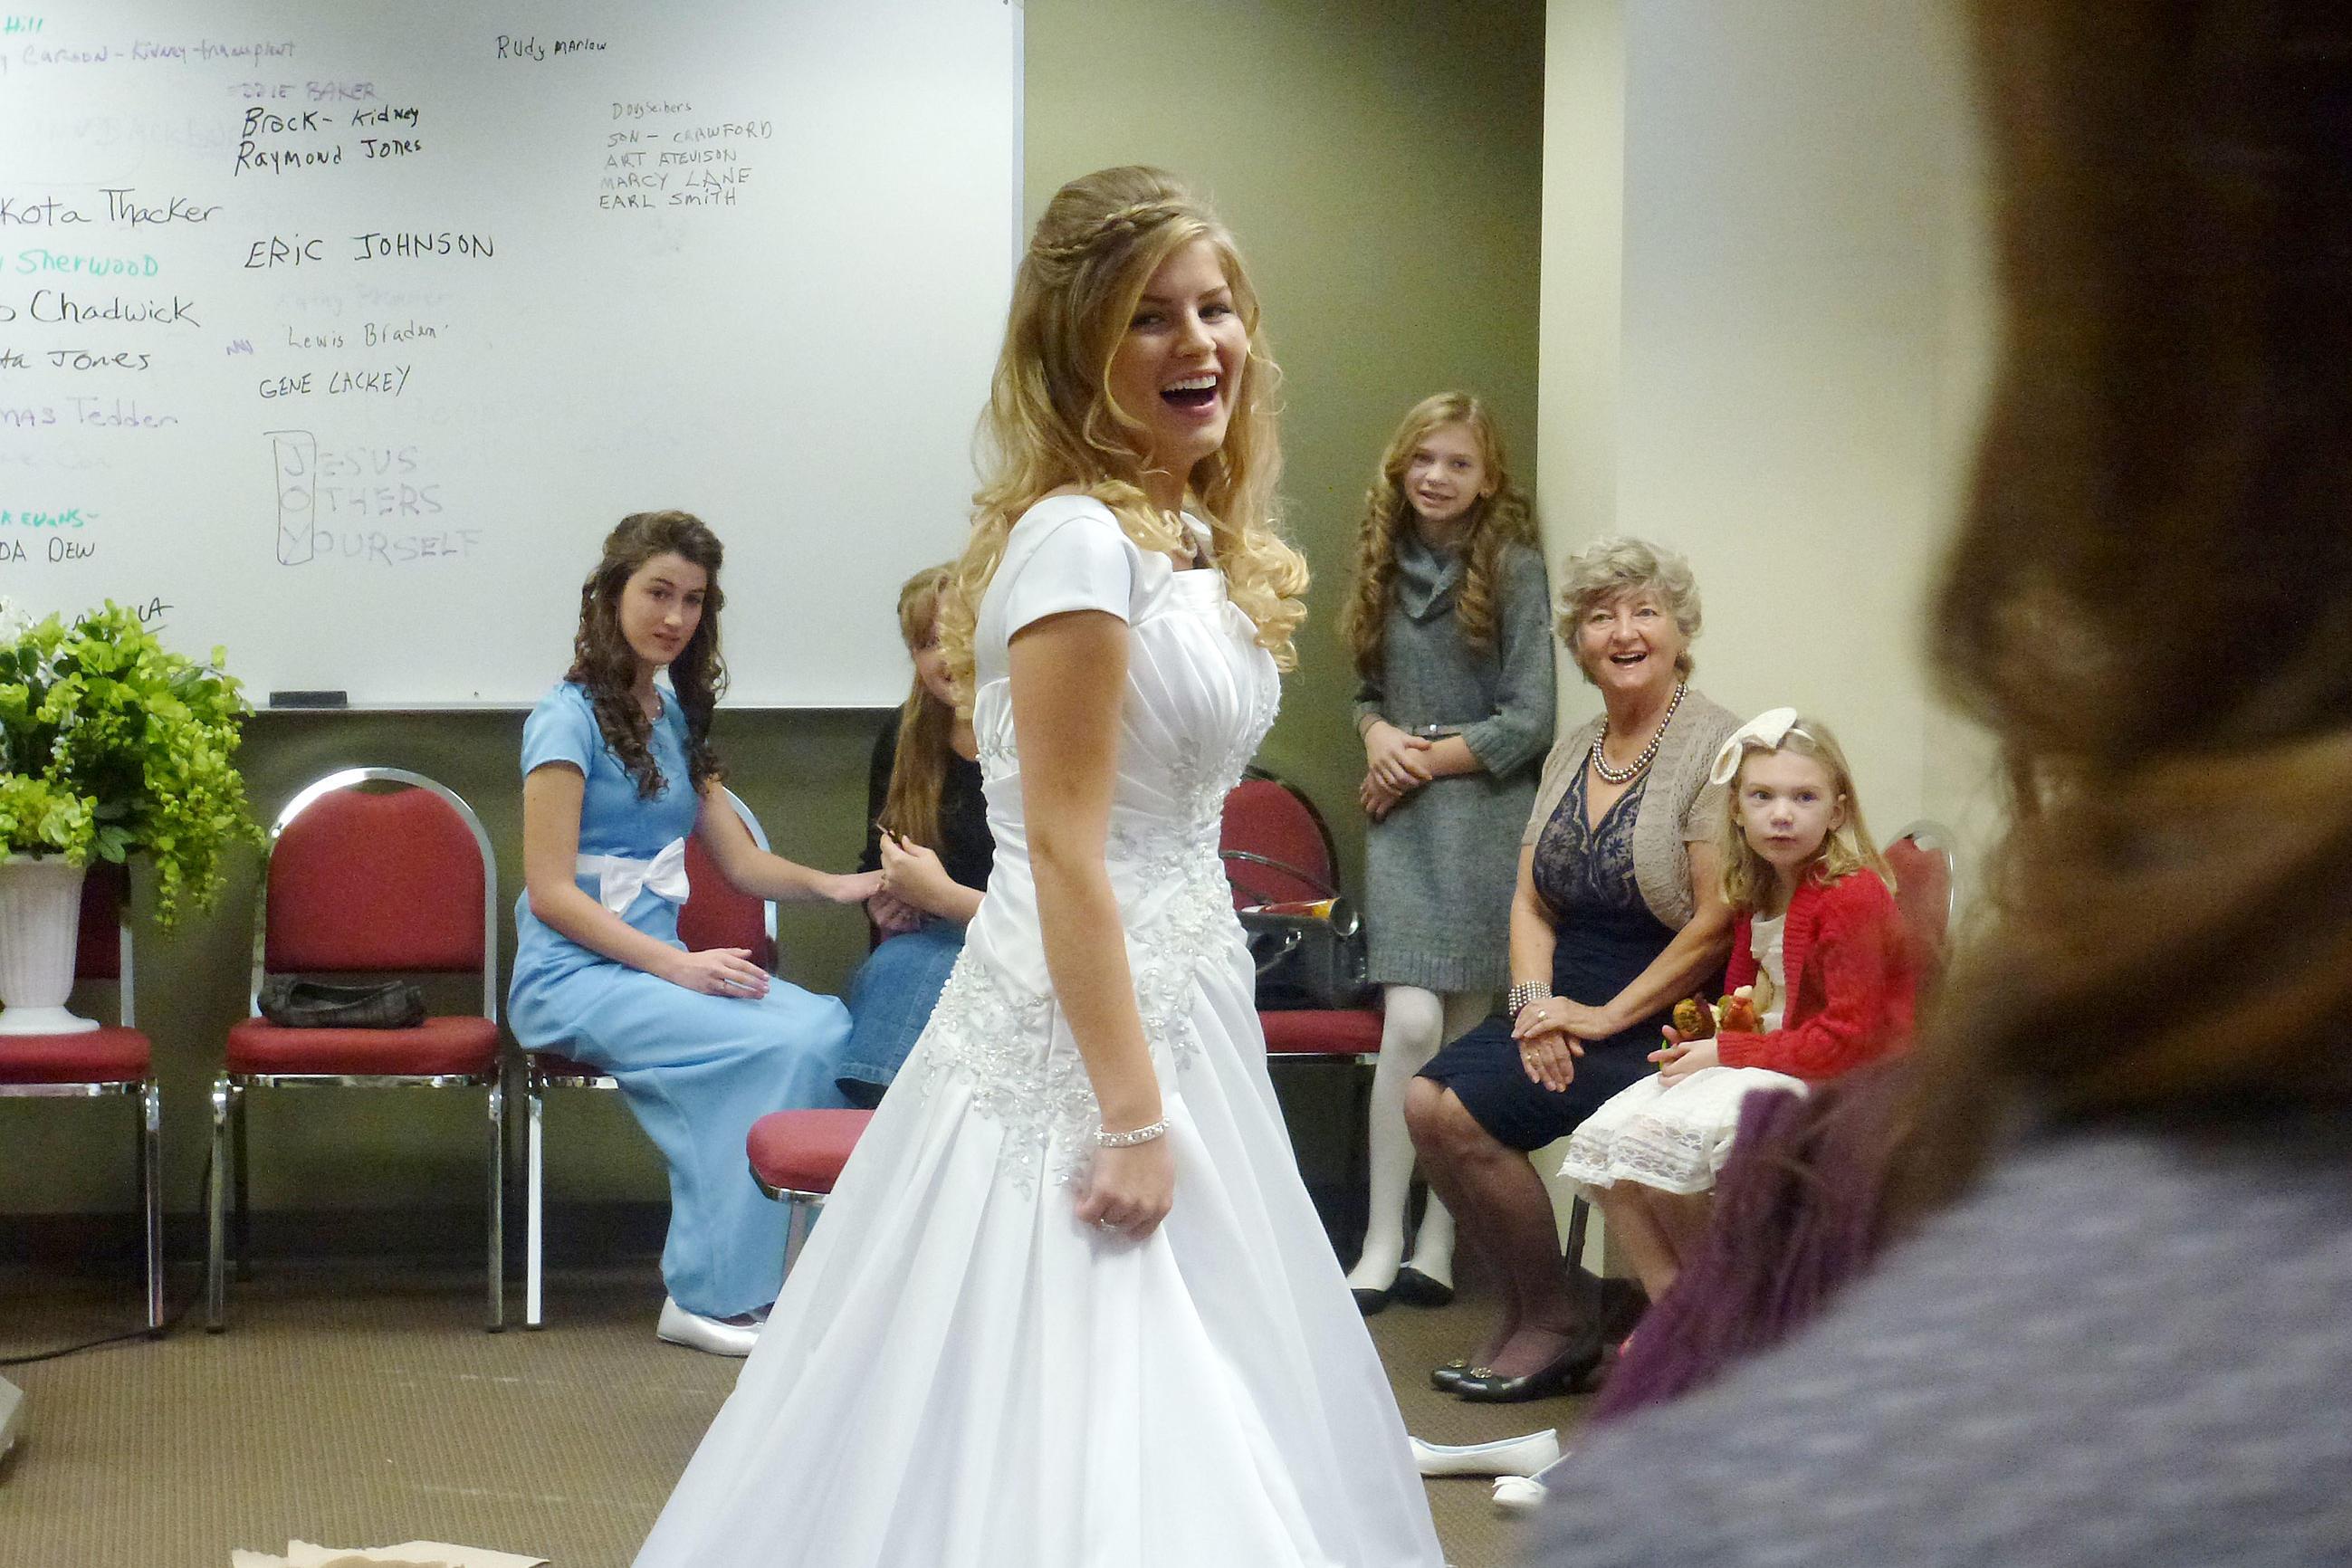 Erin Bates Models Her Wedding Dress